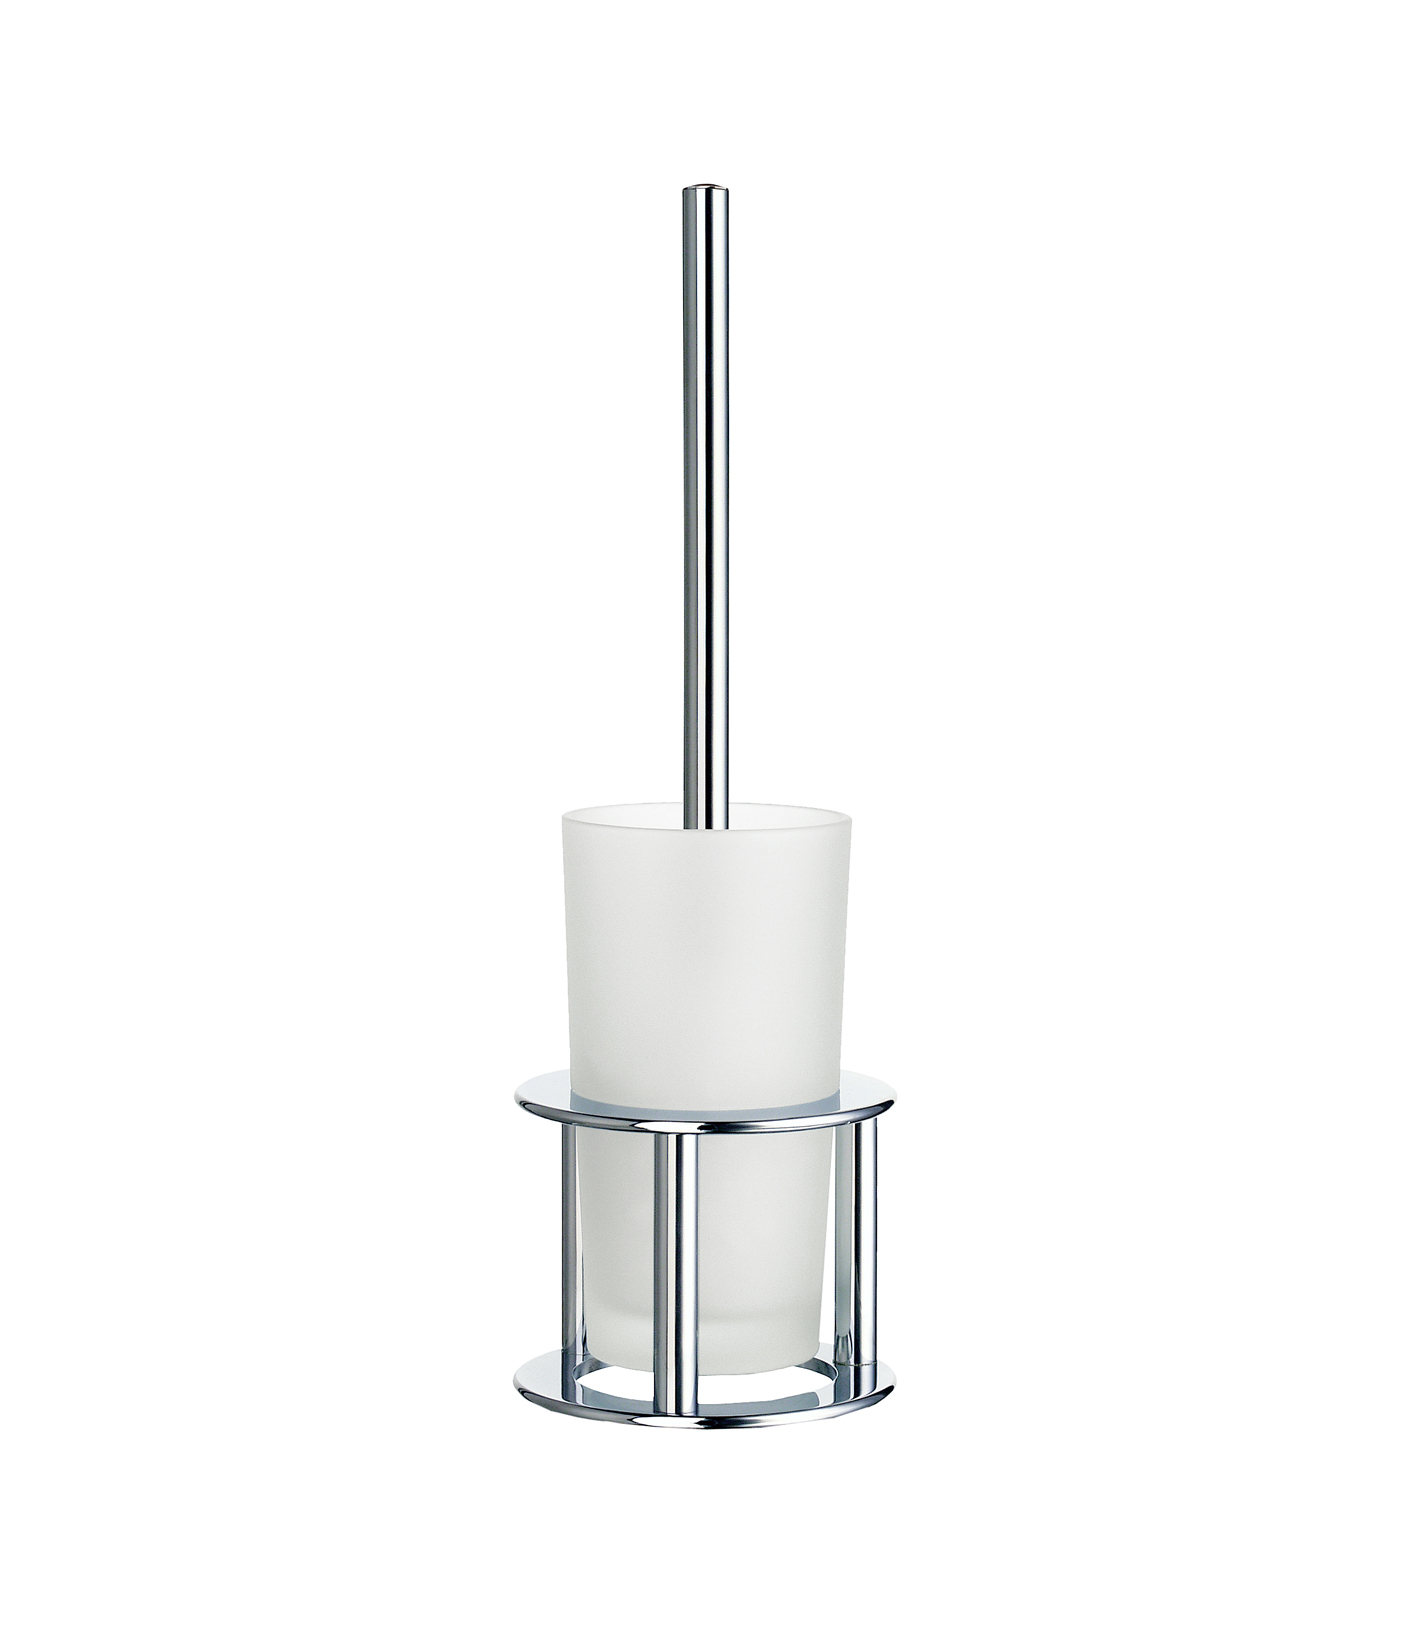 smedbo outline wc b rstengarnitur freistehend fk102 badausstattung. Black Bedroom Furniture Sets. Home Design Ideas